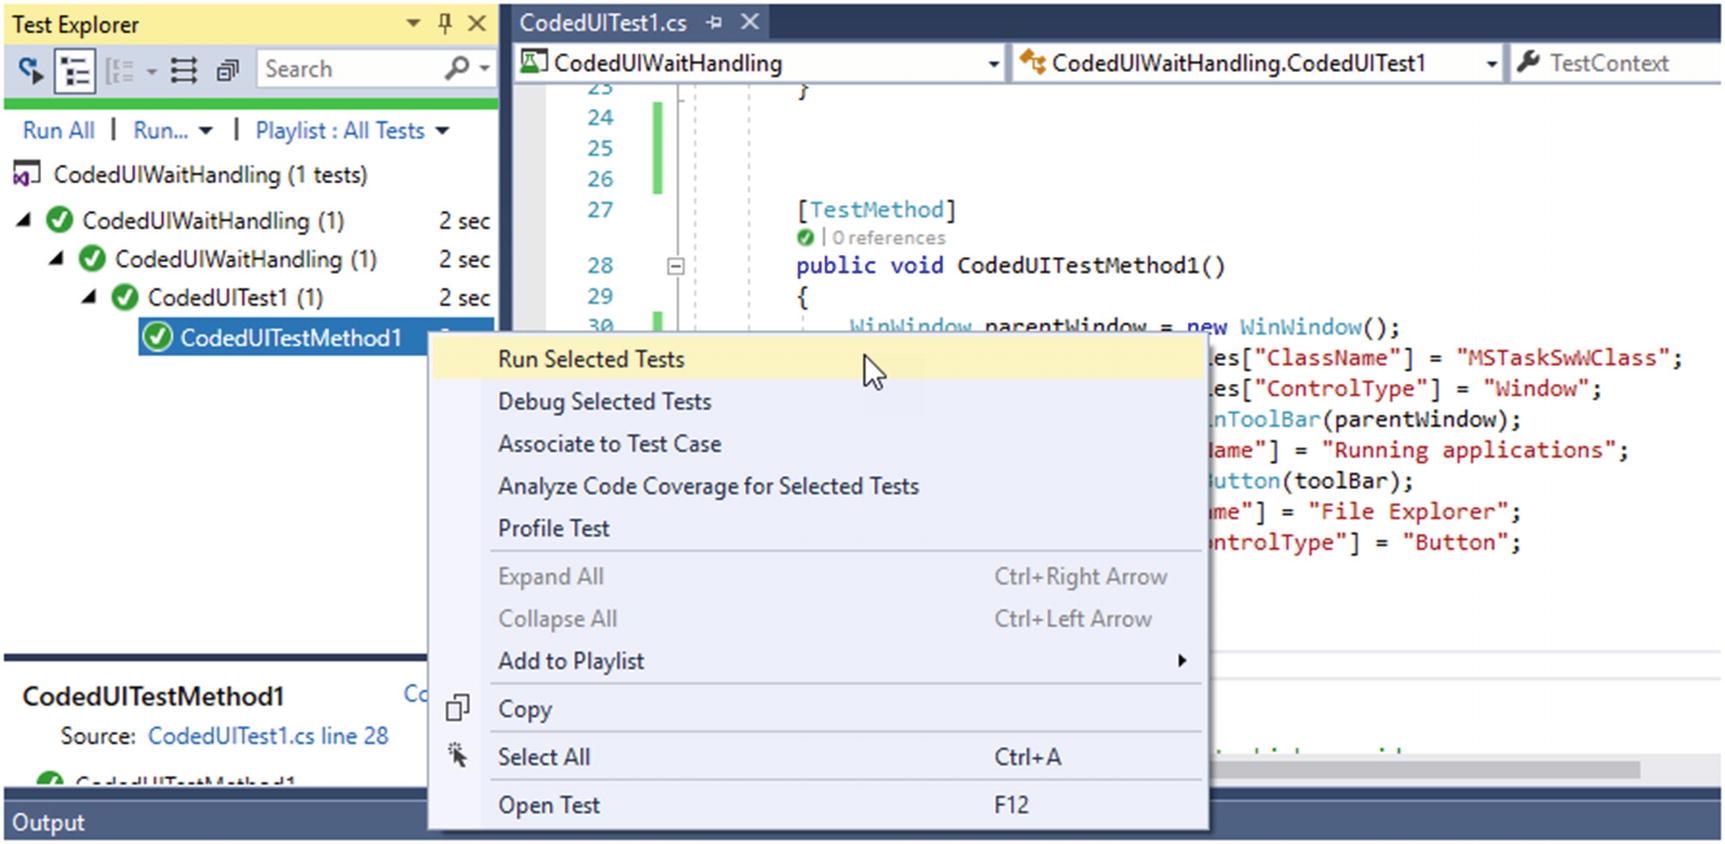 Functional Testing for Windows Apps | SpringerLink